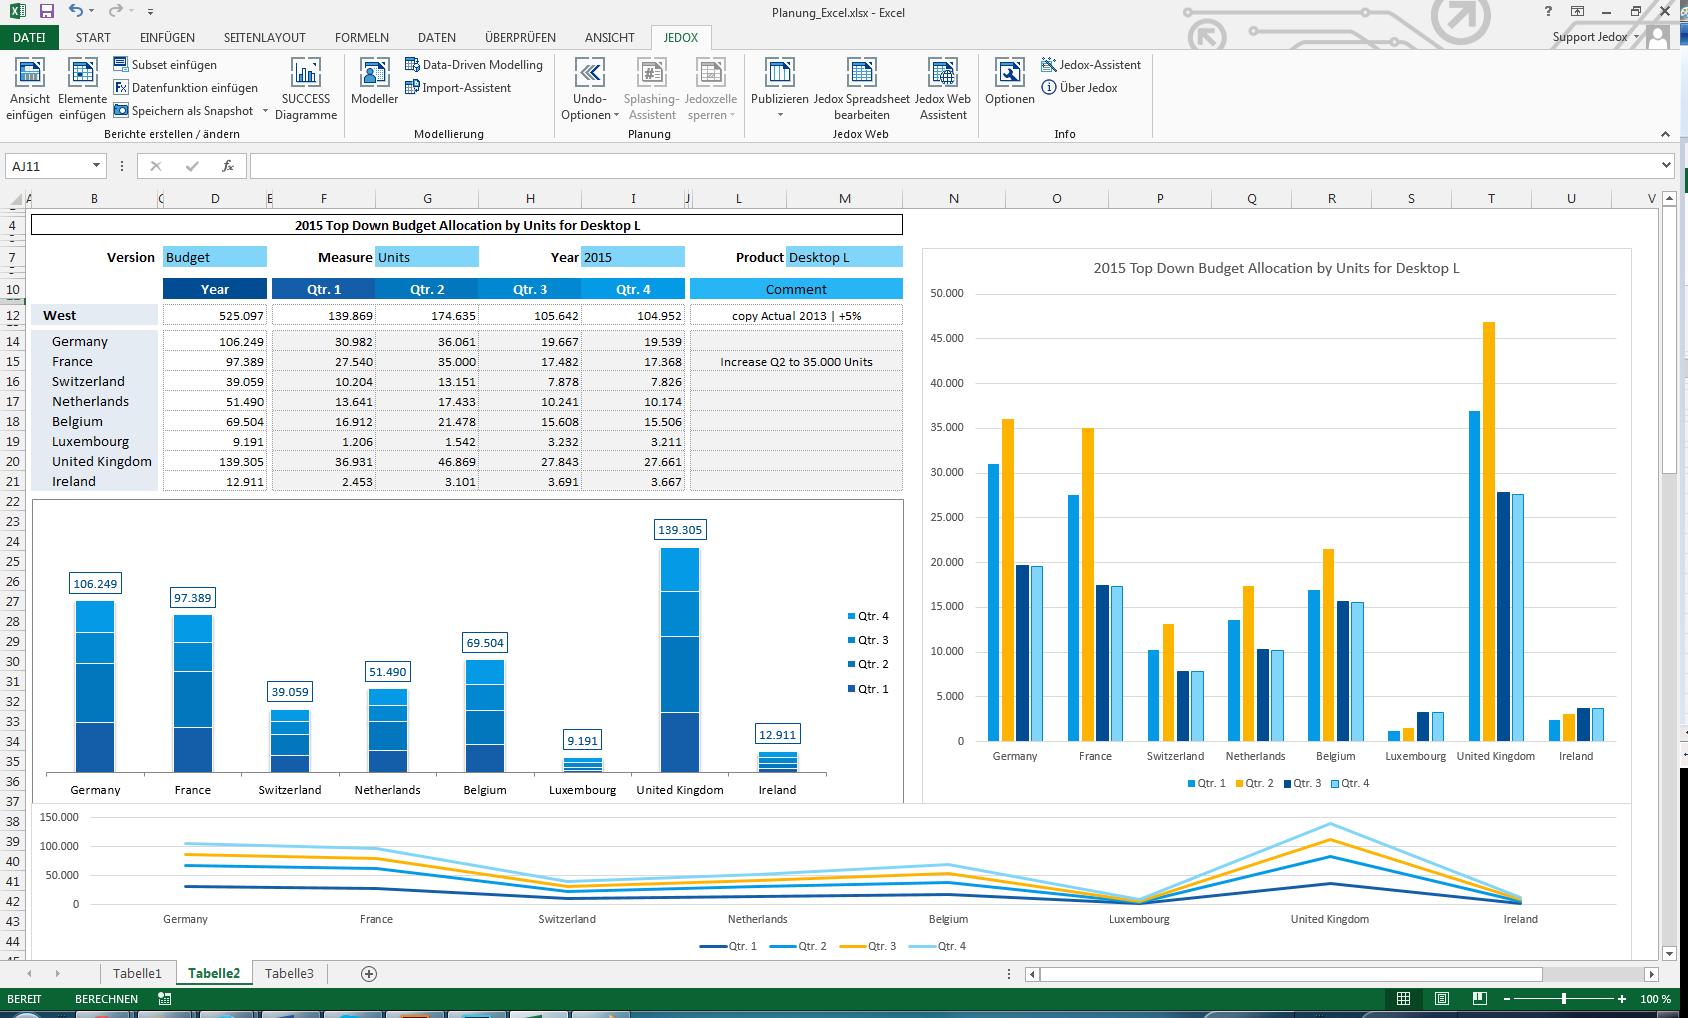 Jedox integriert in Excel